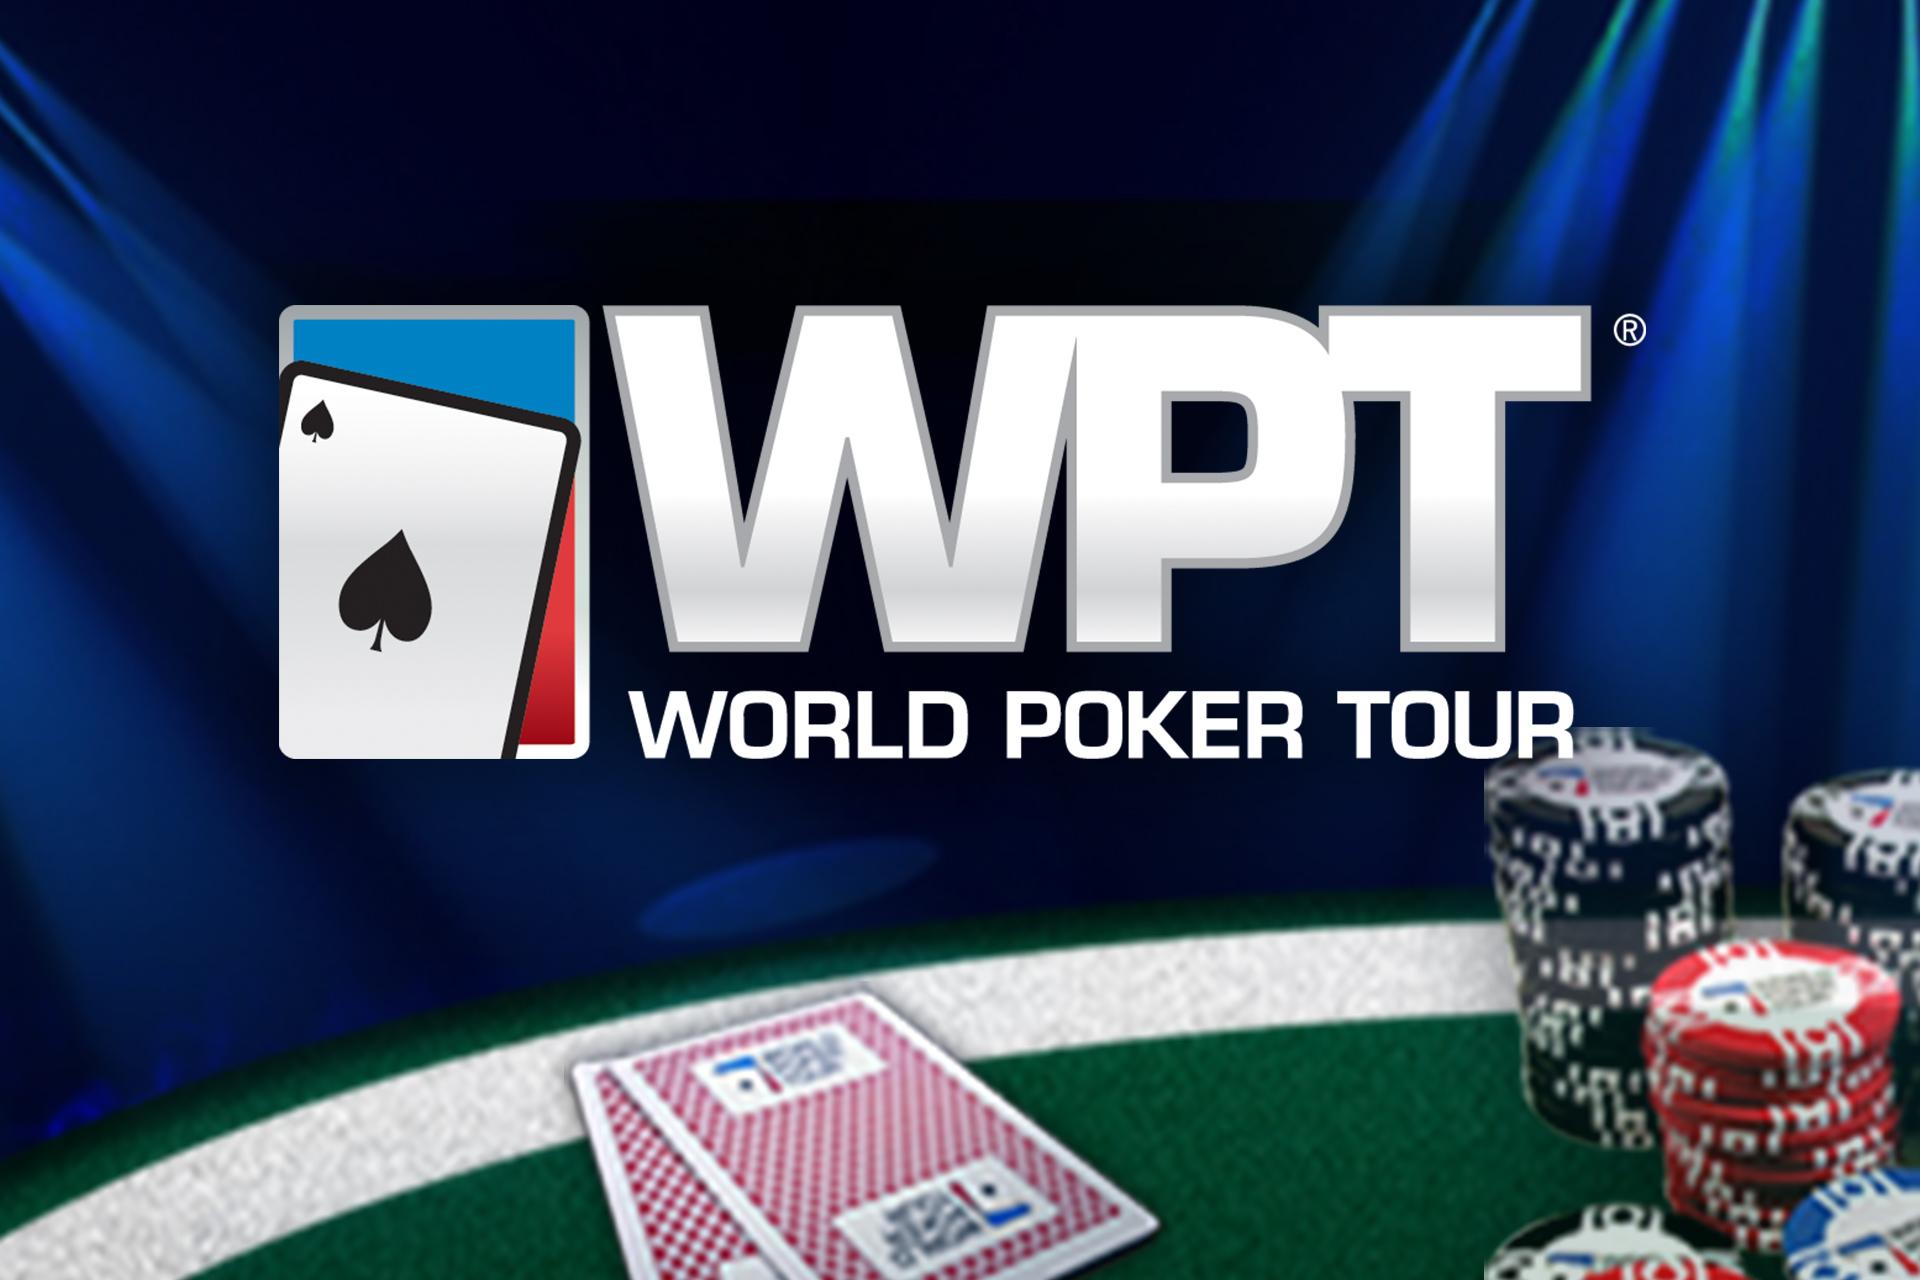 world_poker_tour_1920x1280.jpg